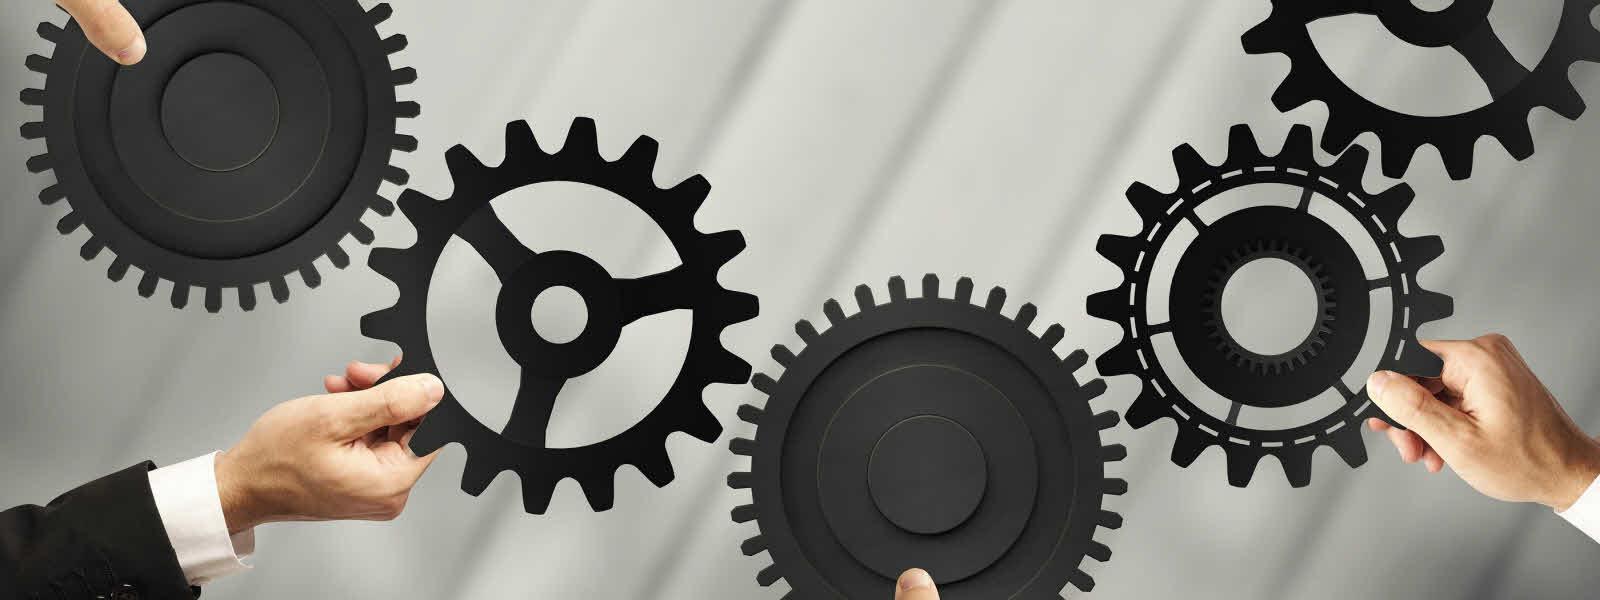 Building Channel Incentive Programs for Maximum Effectiveness